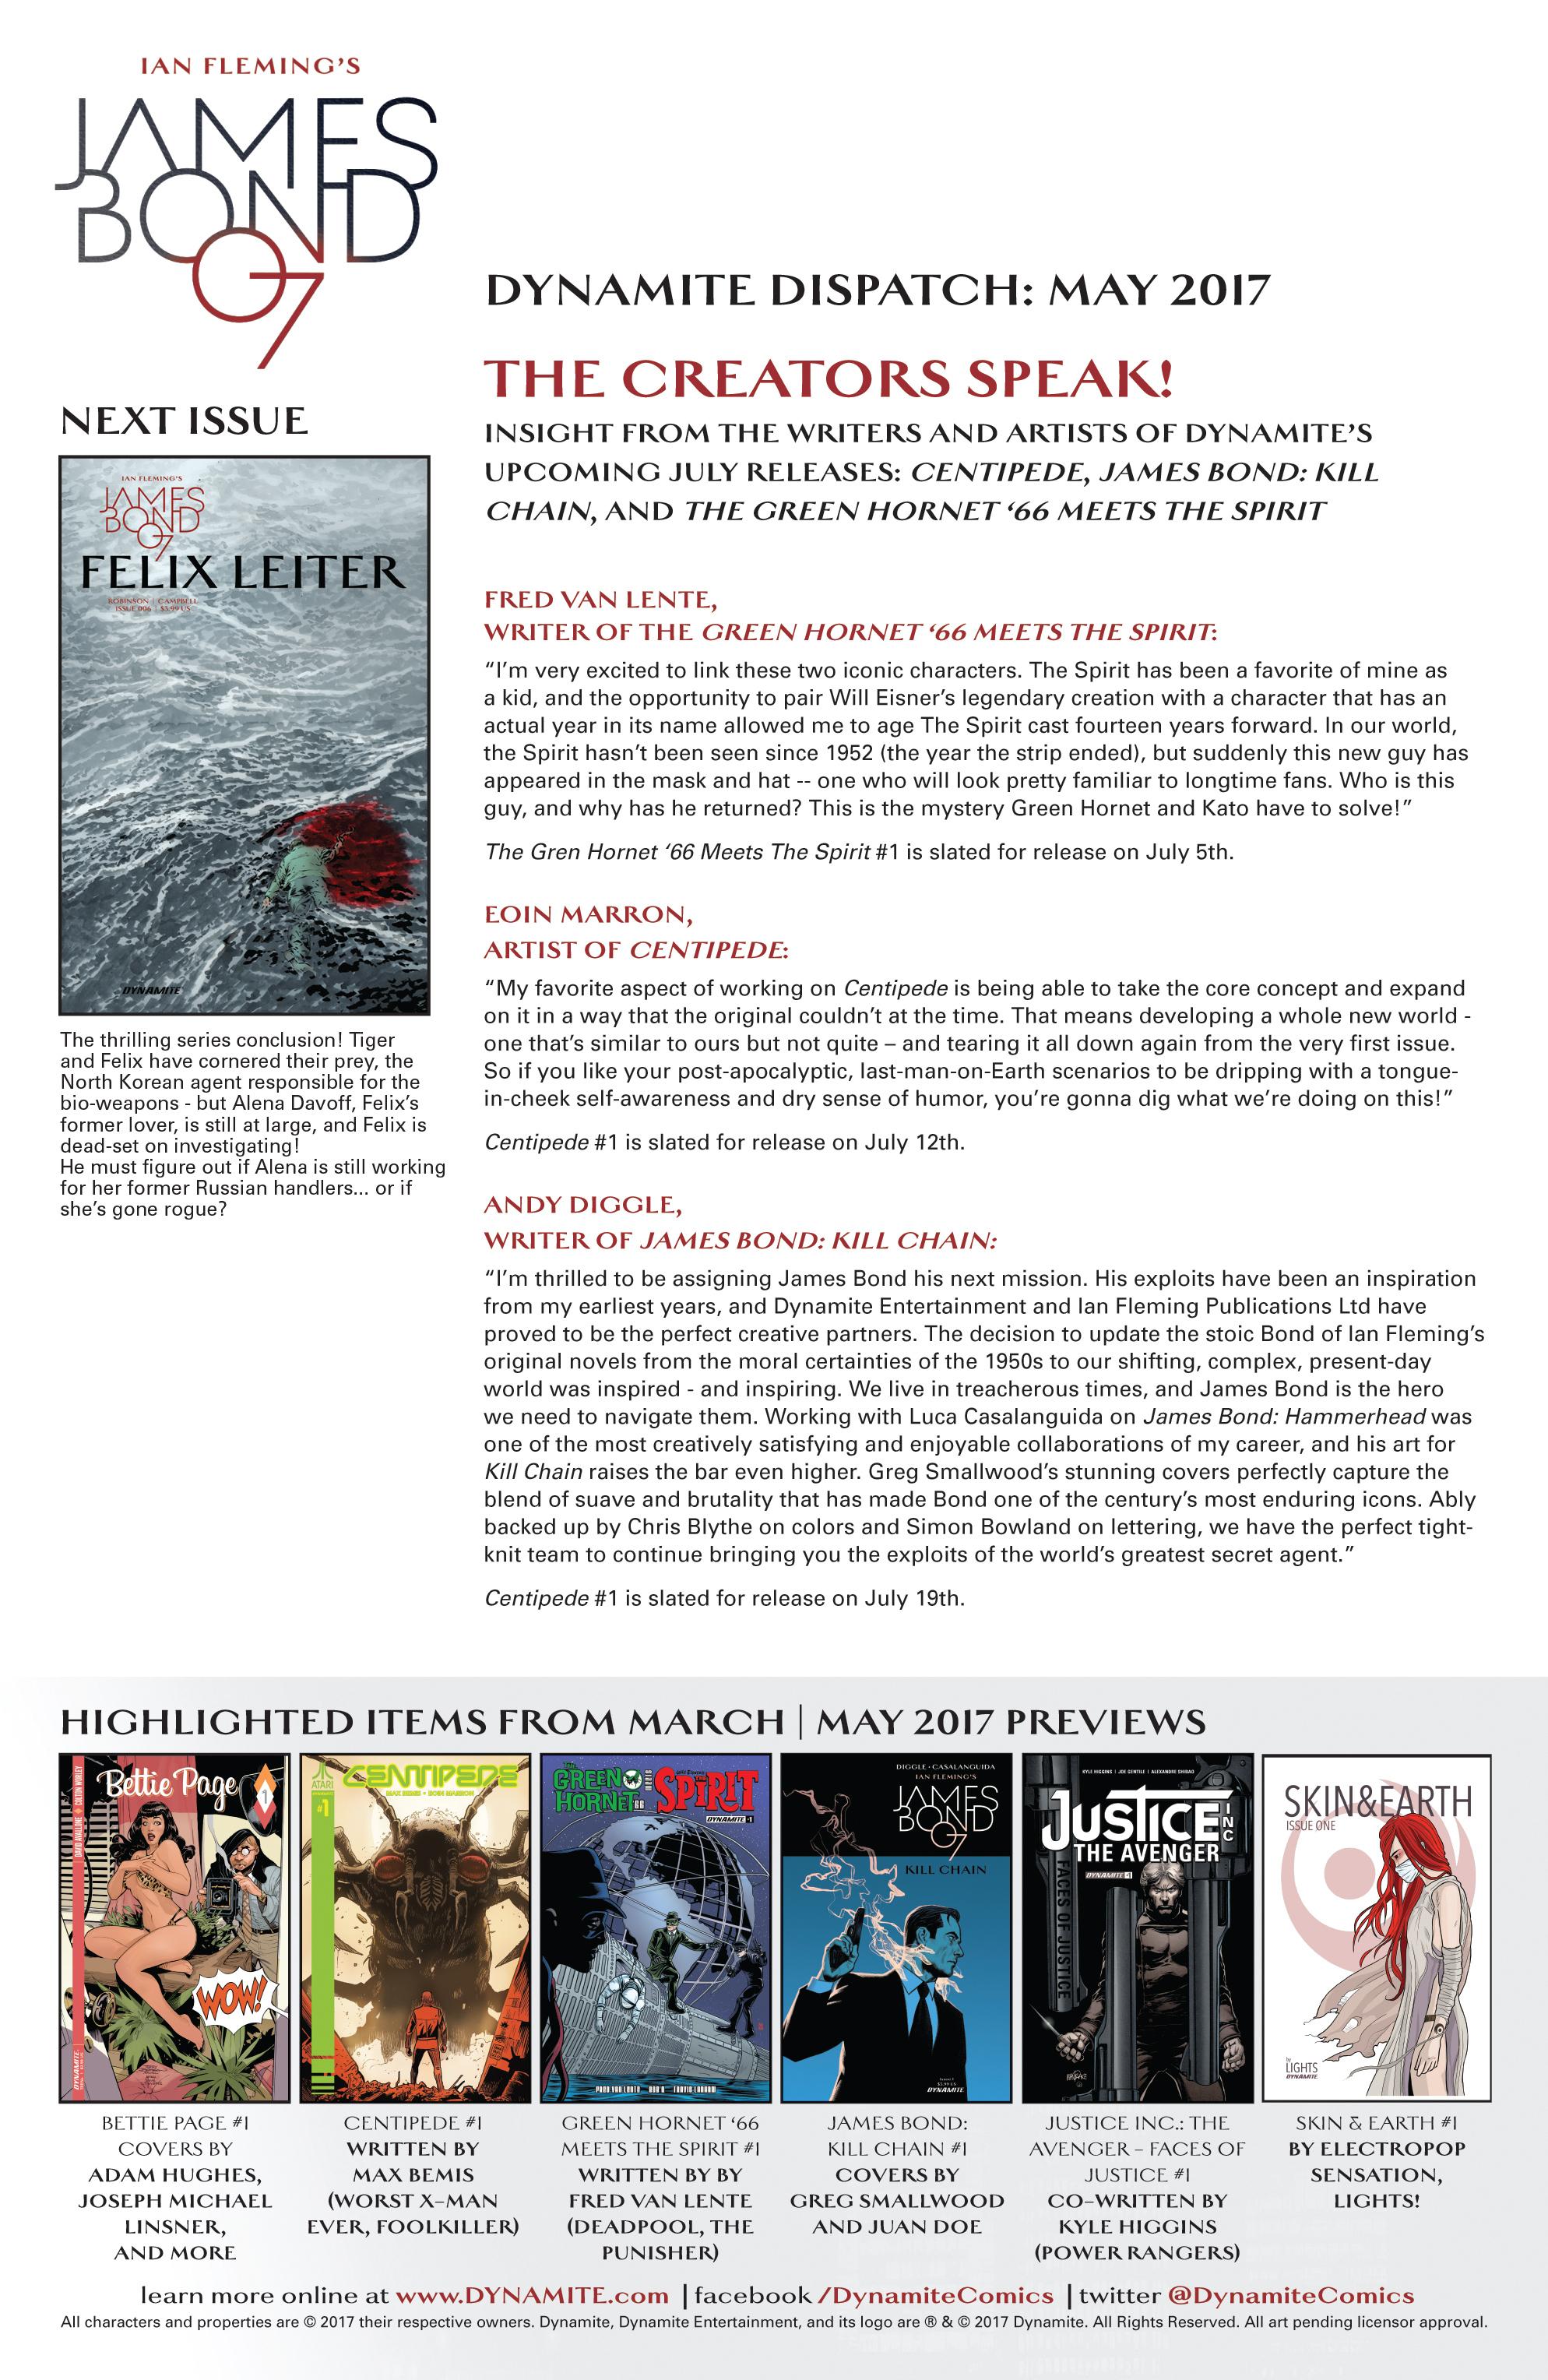 Read online James Bond: Felix Leiter comic -  Issue #5 - 21